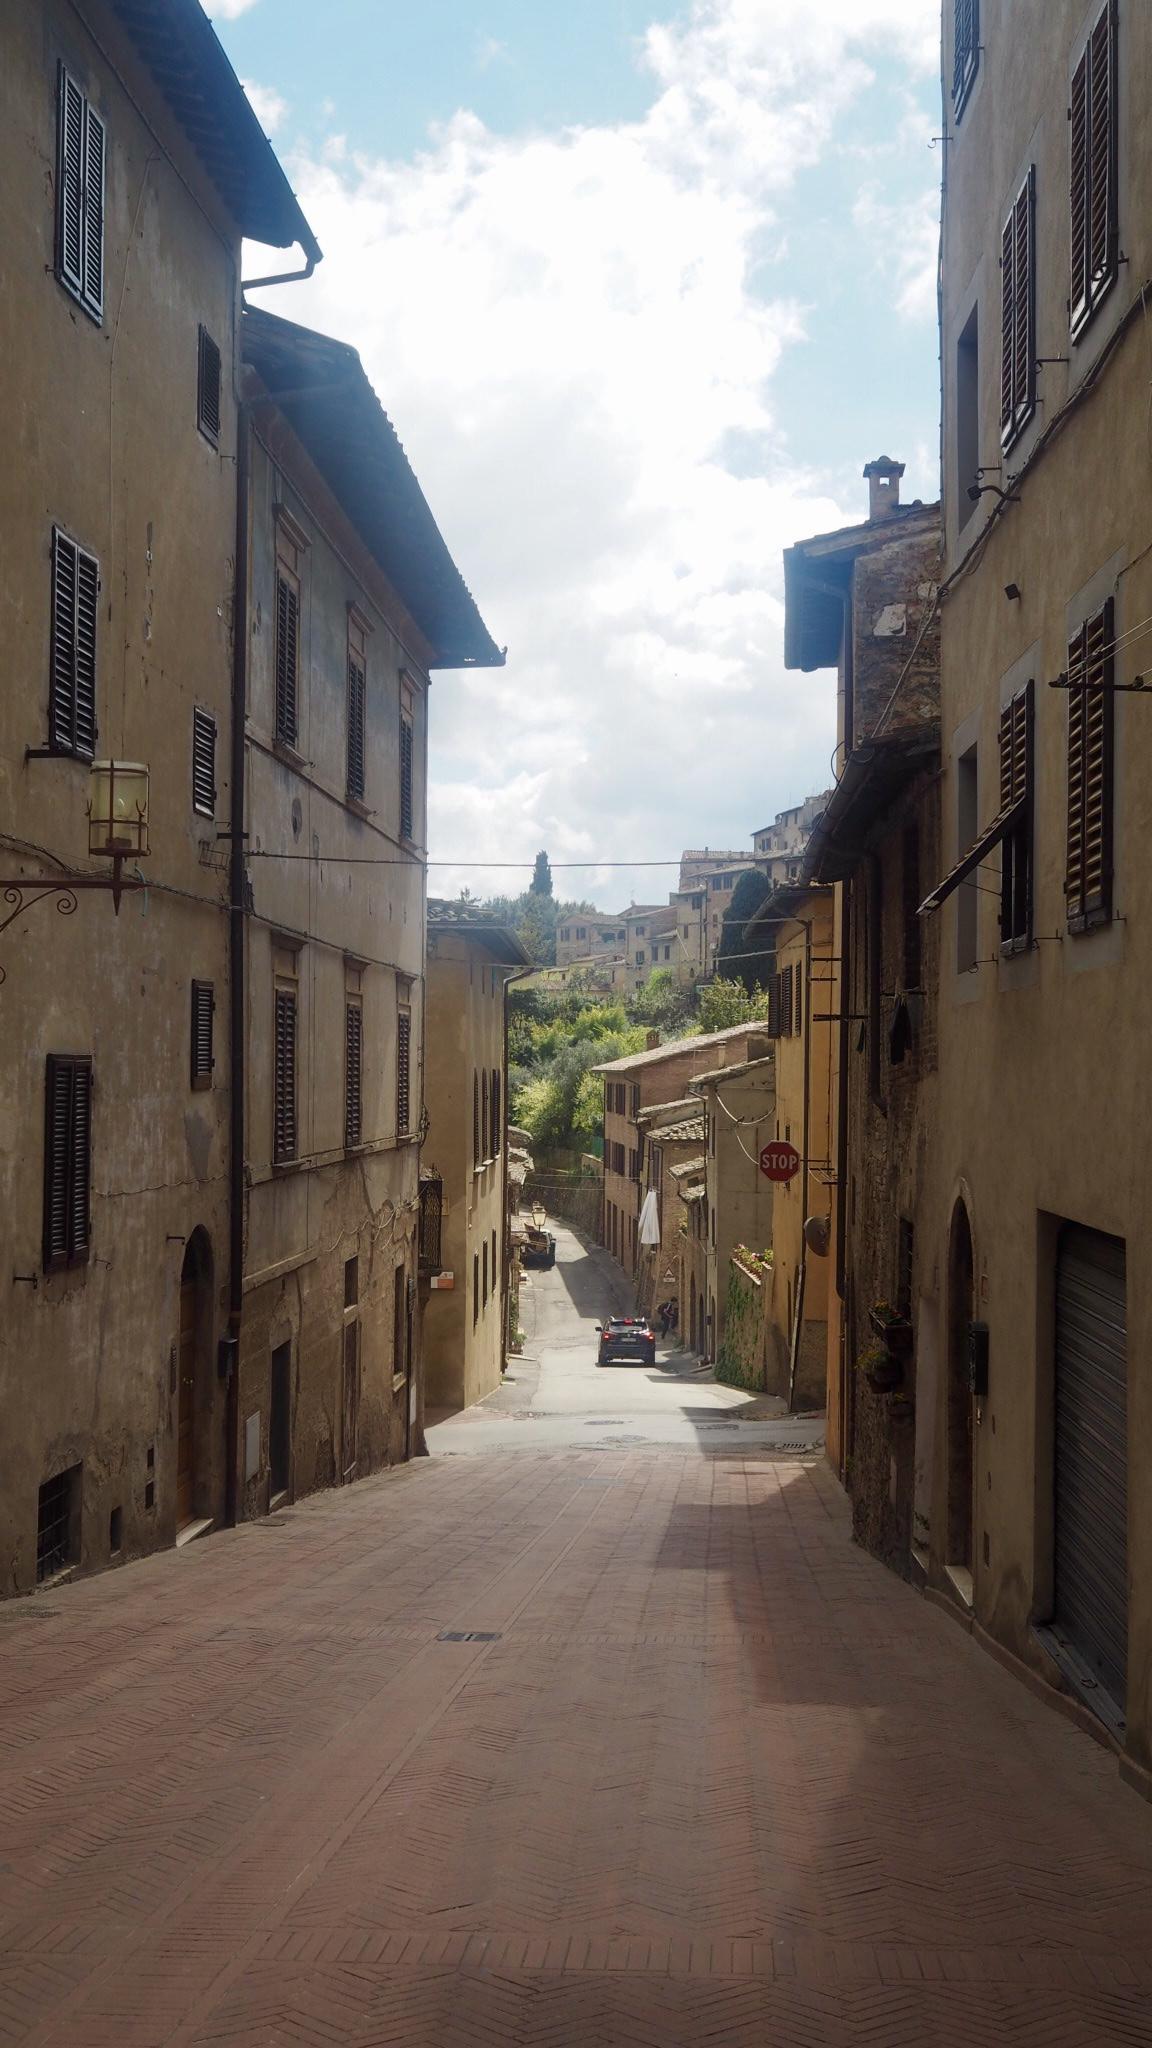 San Gimigano nok en Toscana perle!